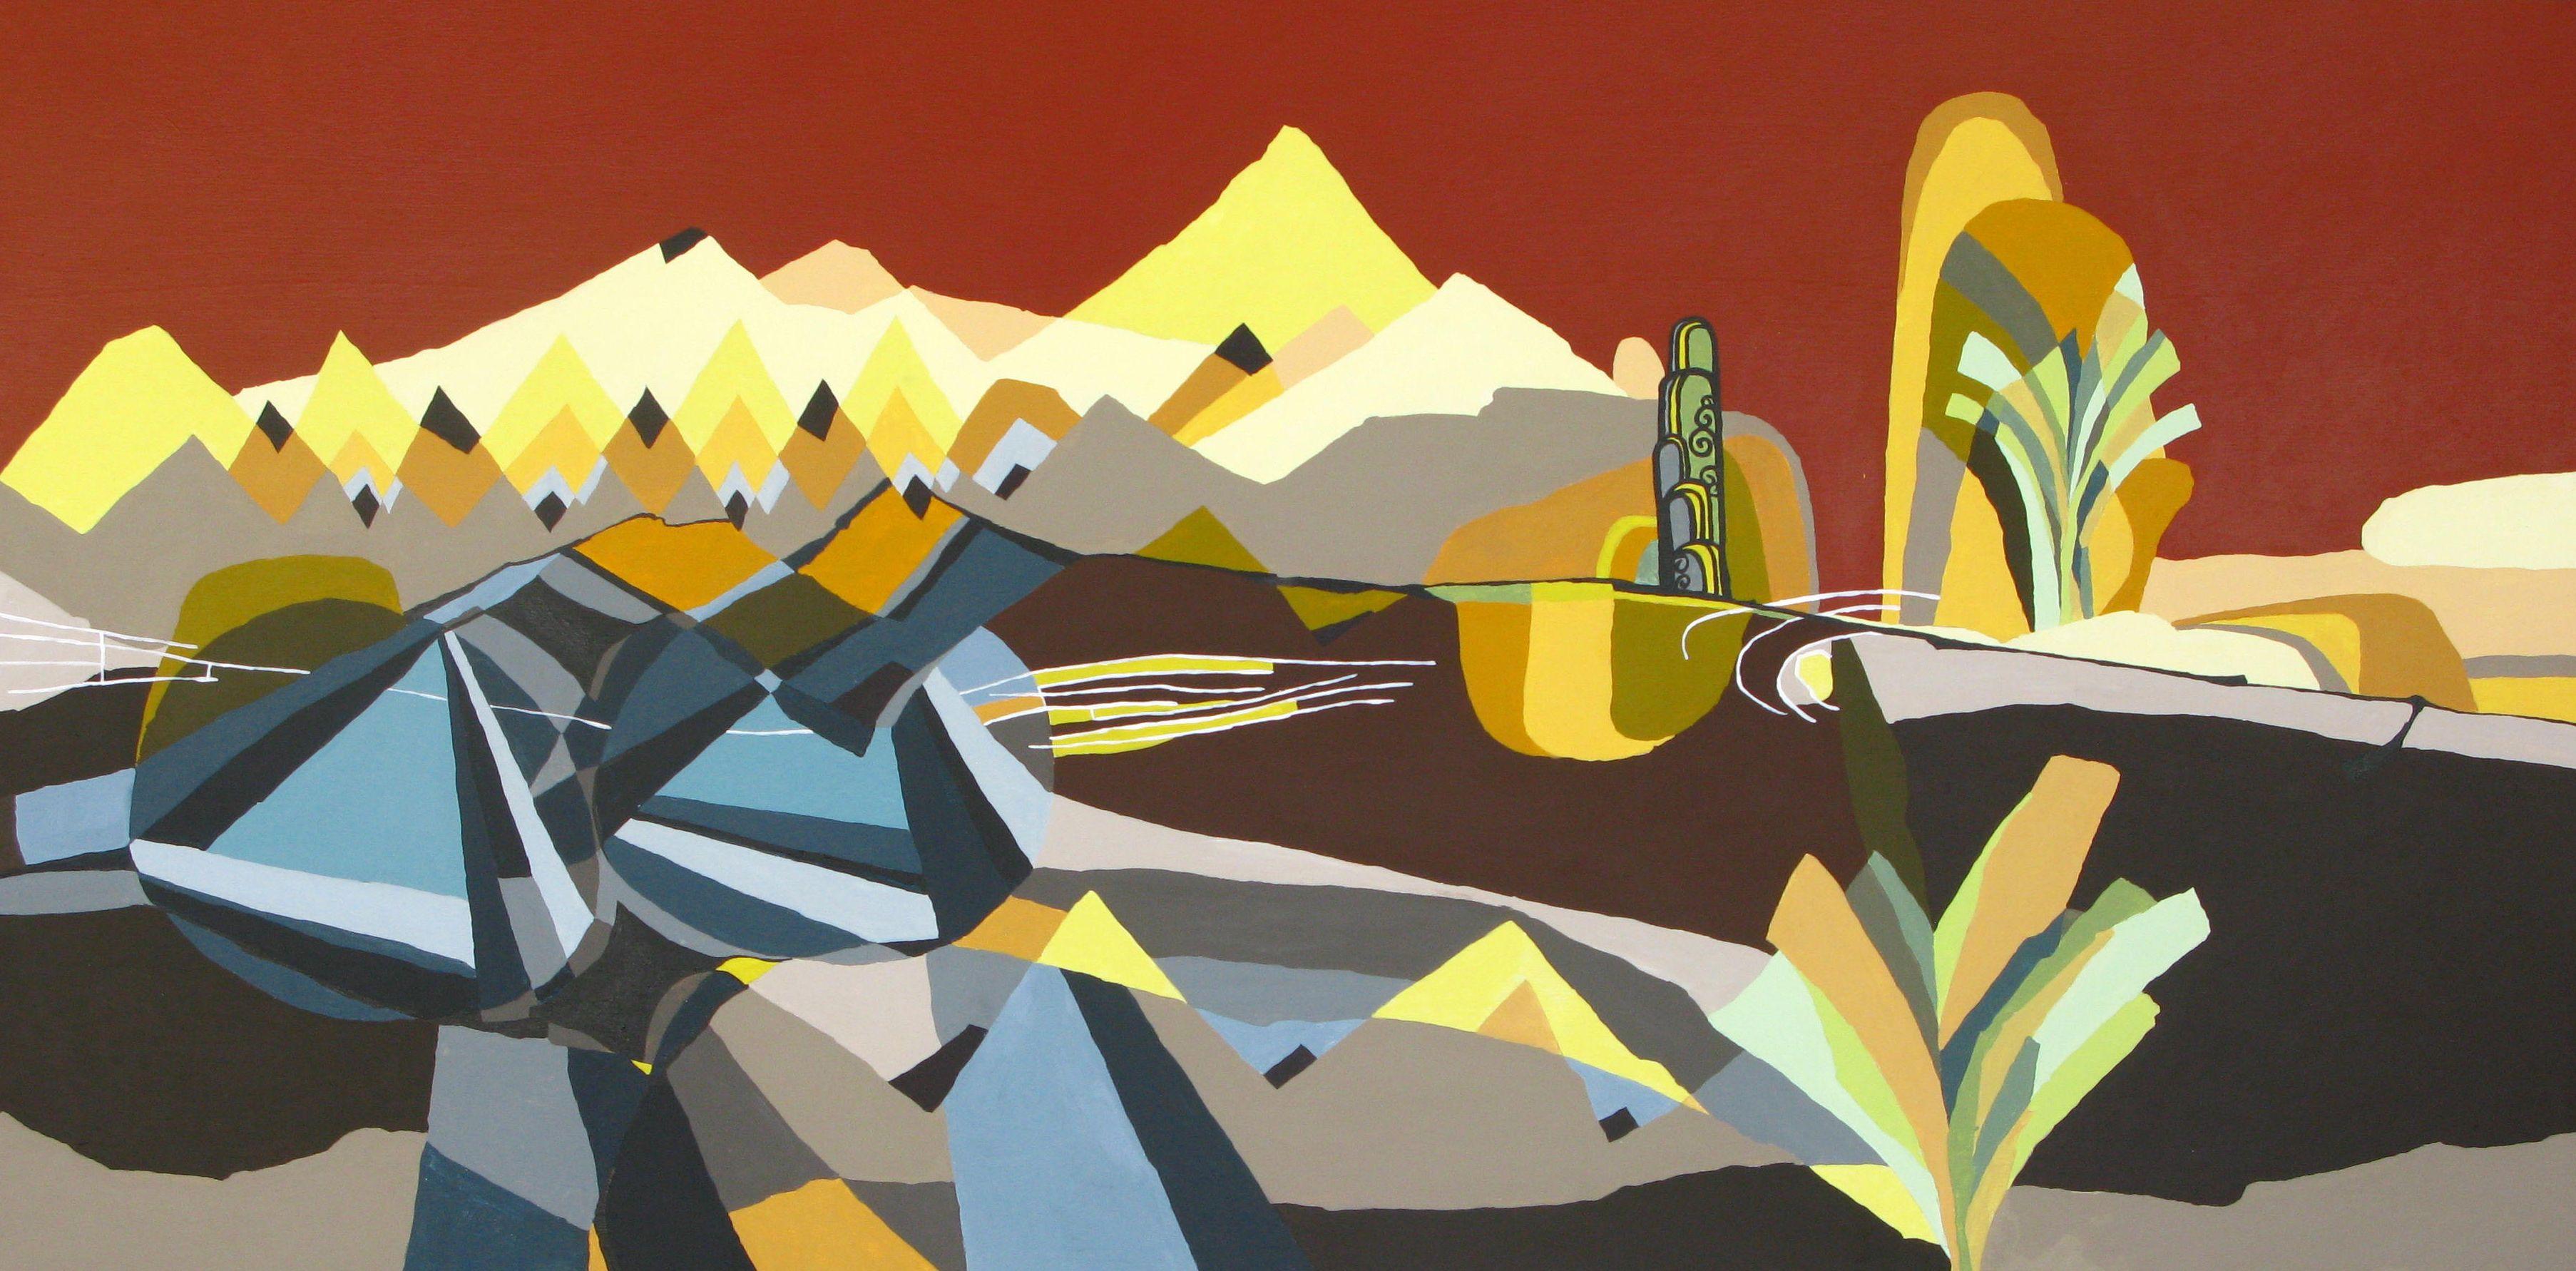 Art deco place acrylic on panel 24 x 48 2012 by ryan